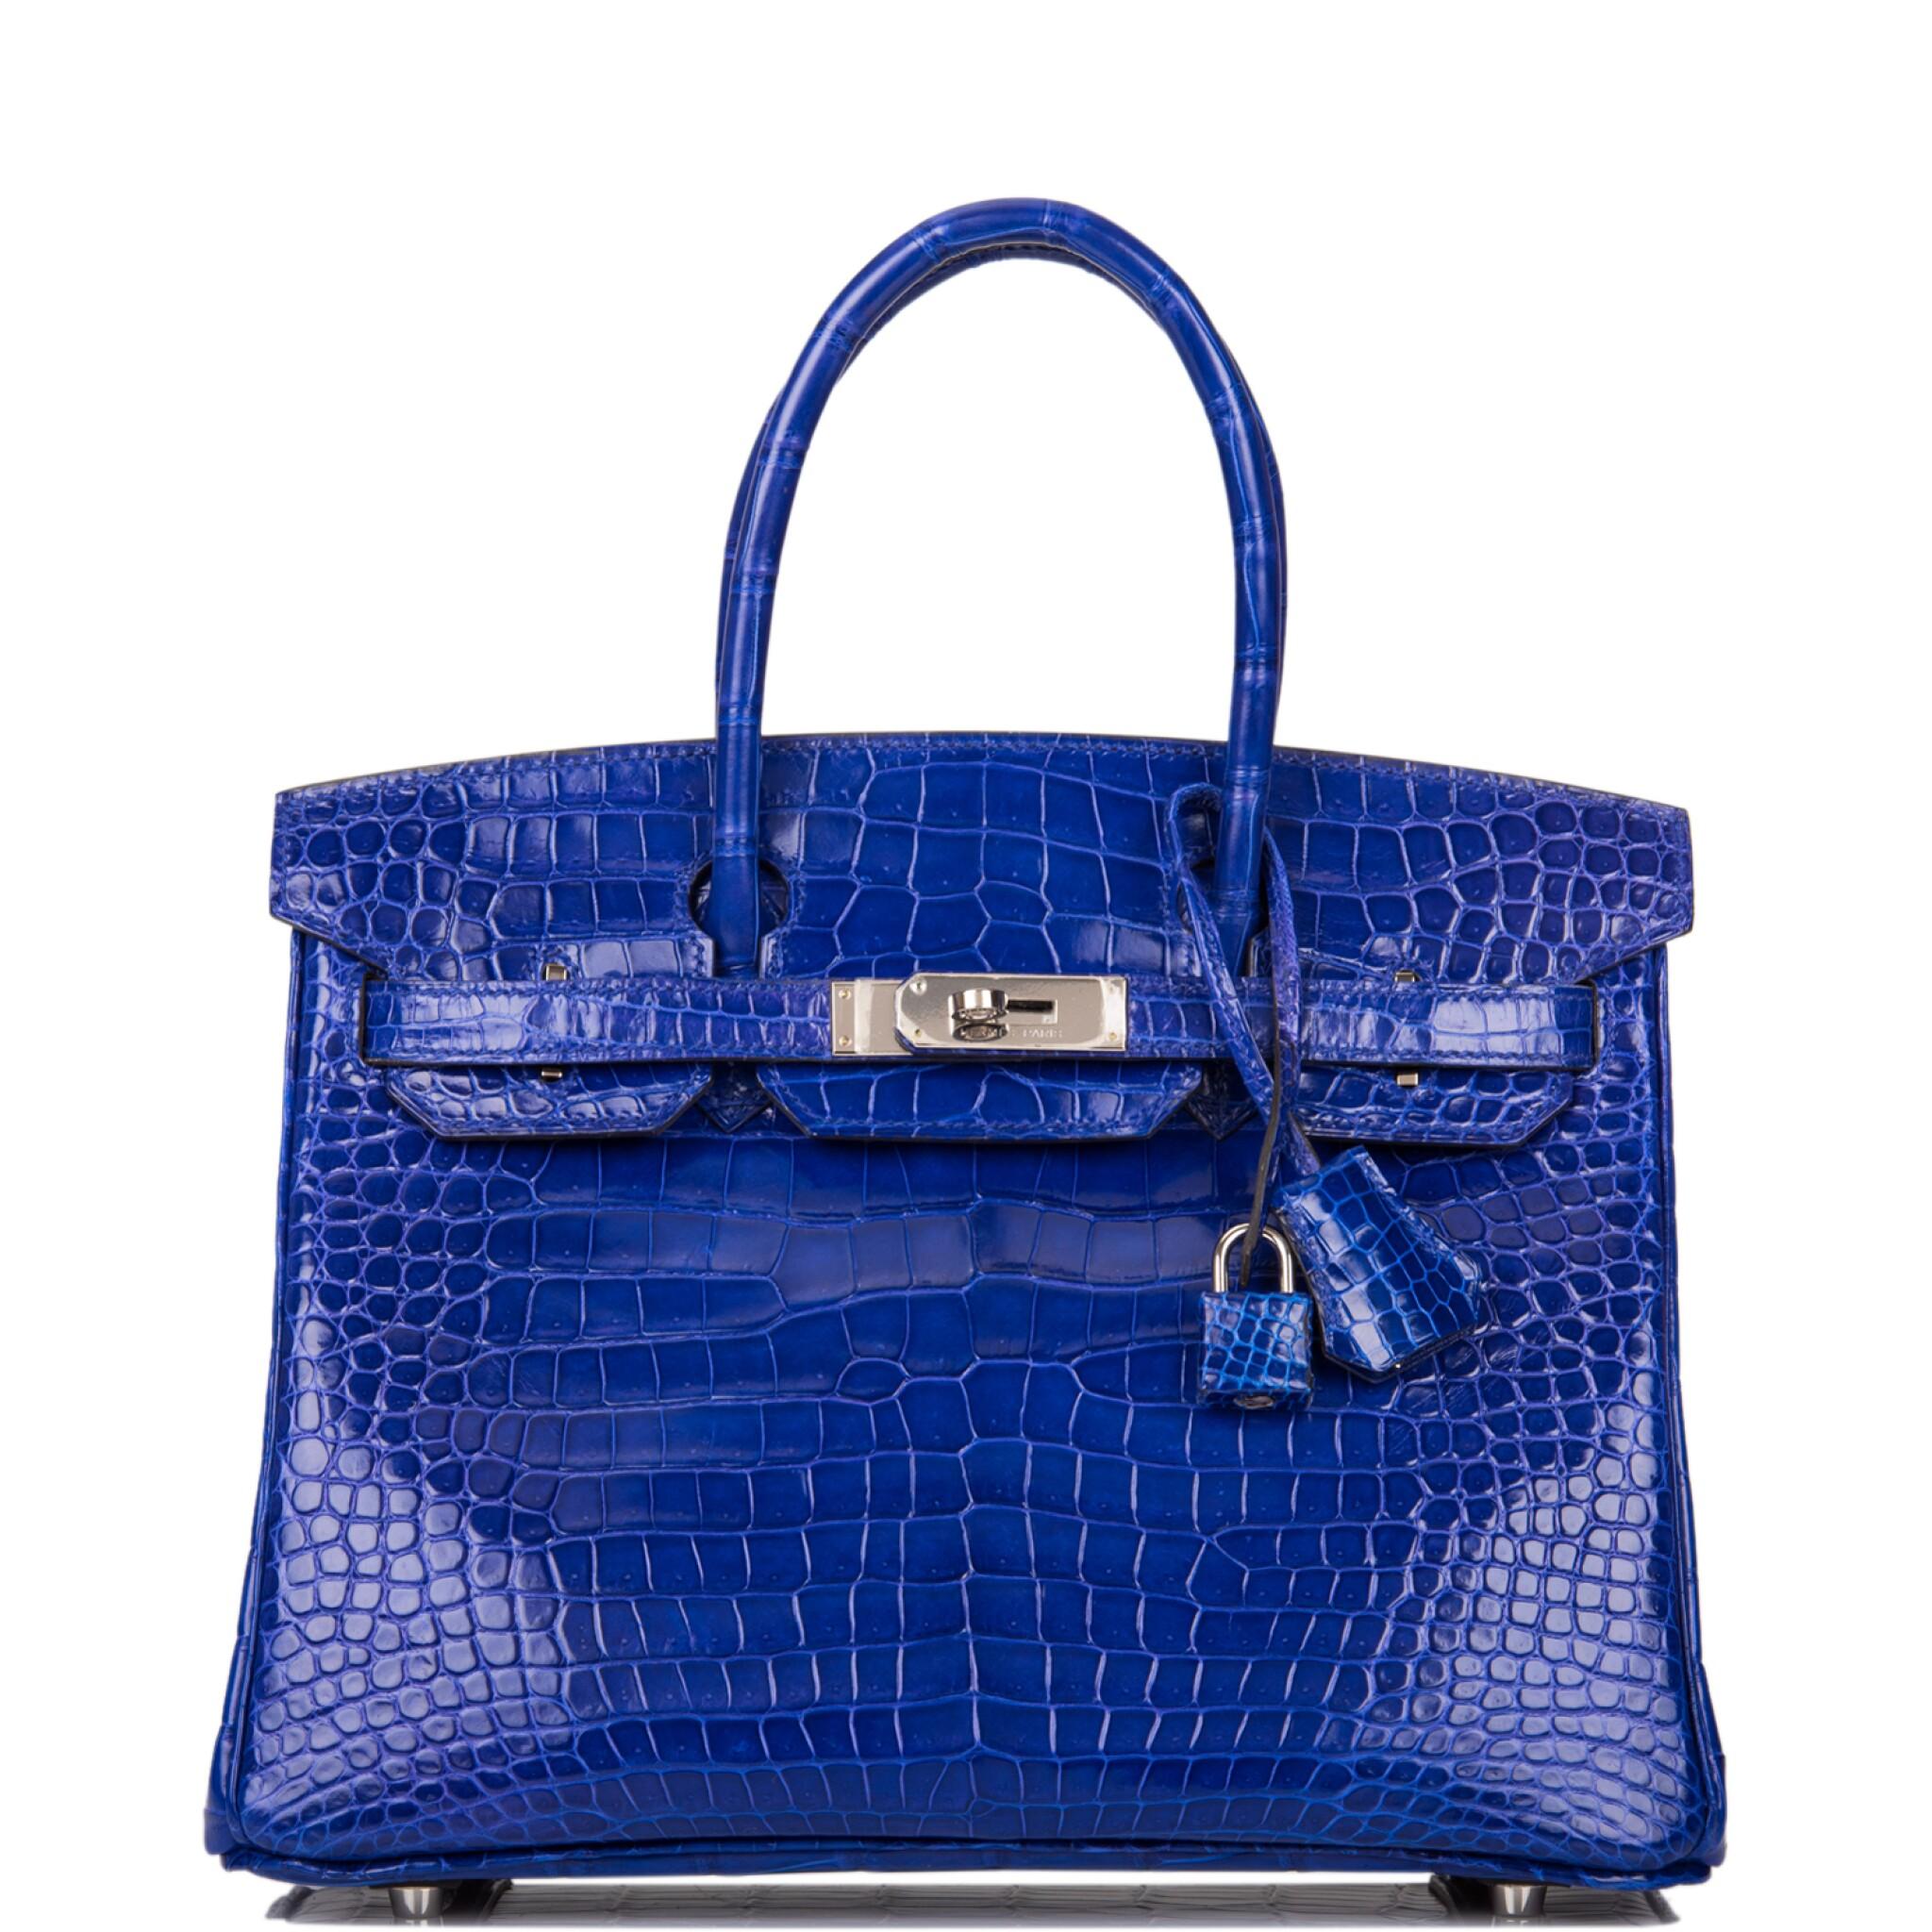 View full screen - View 1 of Lot 7. Hermès Bleu Electrique Birkin 30cm of Shiny Porosus Crocodile with Palladium Hardware.